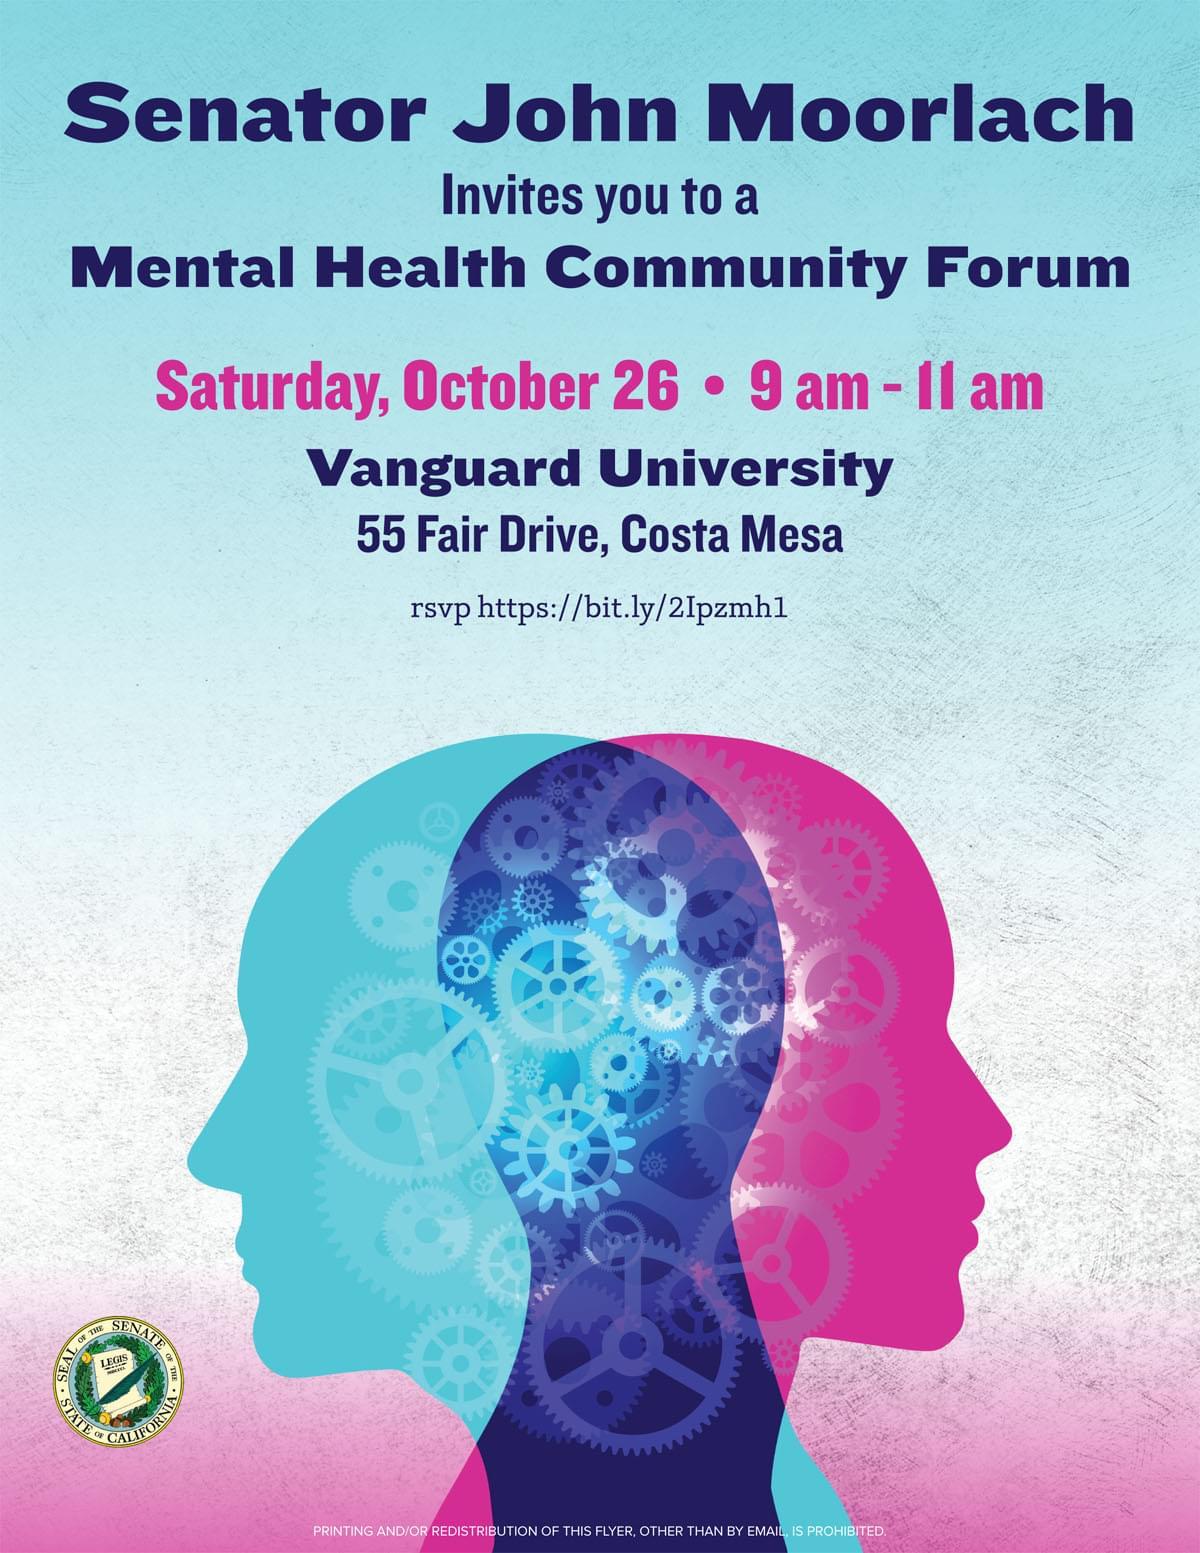 Senator John Moorlach invites you to a Mental Health Community Forum